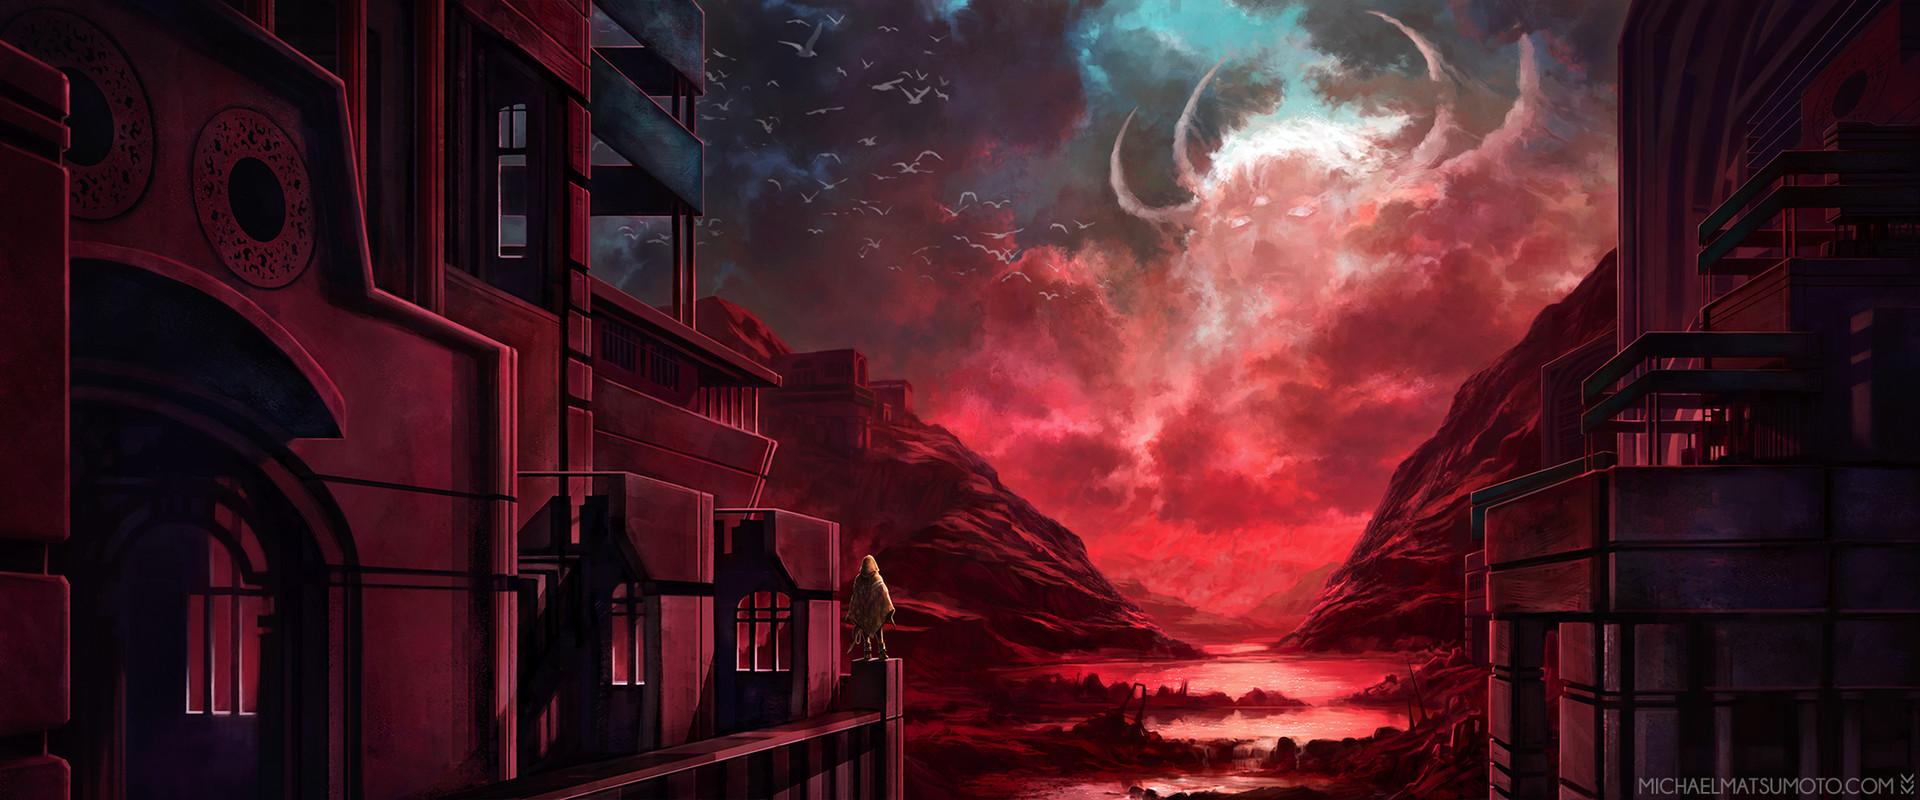 Michael matsumoto celestial almighty watermark